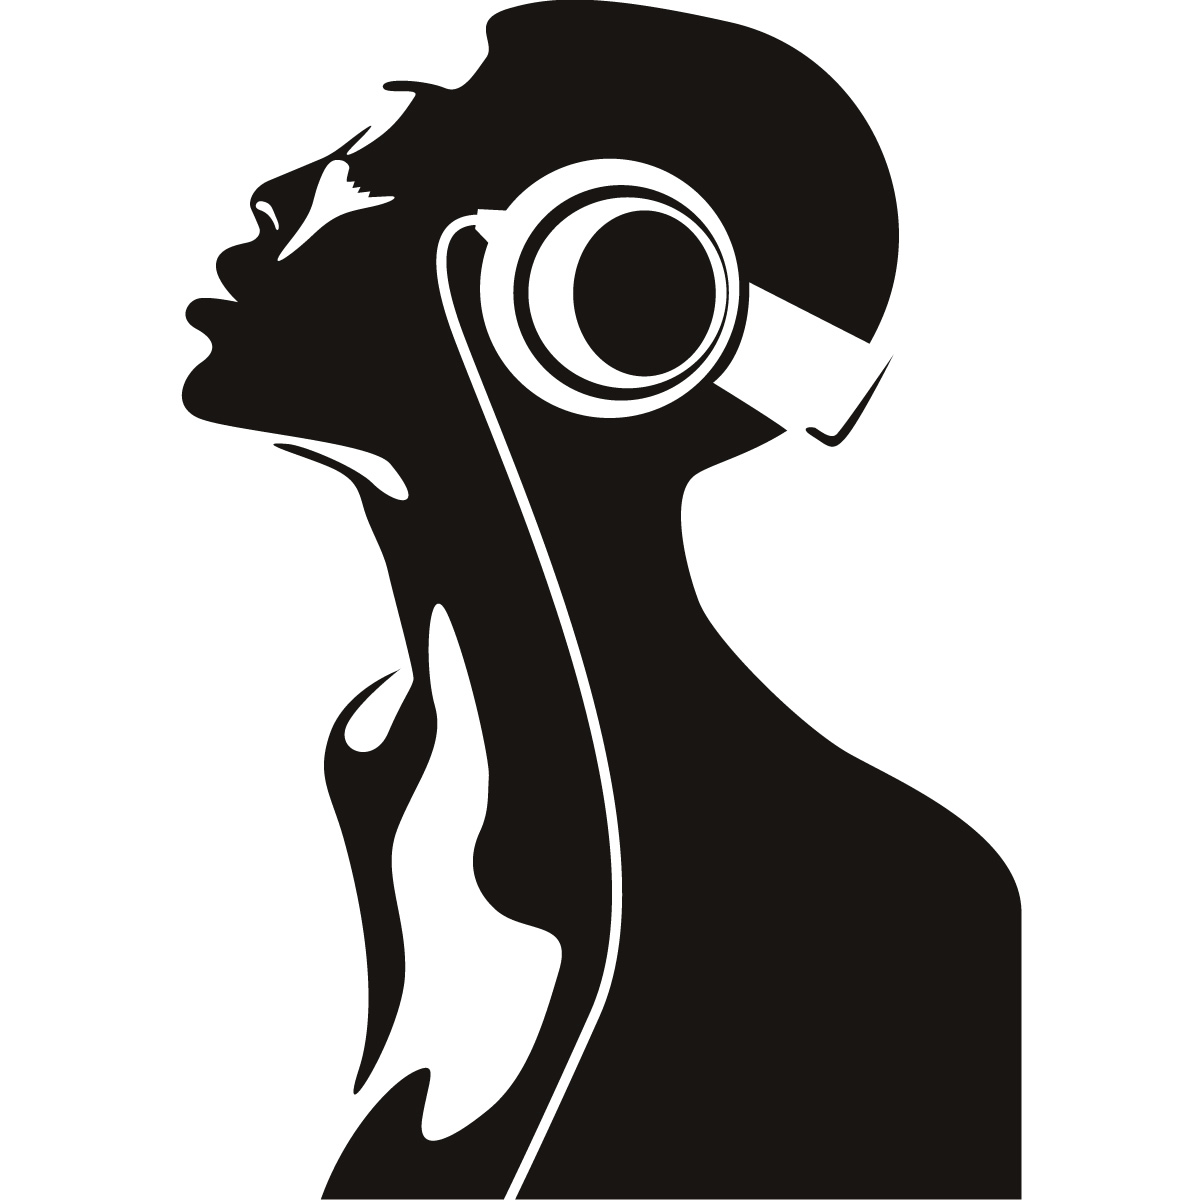 Cool Dj Music Wall Art Stickers Wall Decals Transfers  Ebay